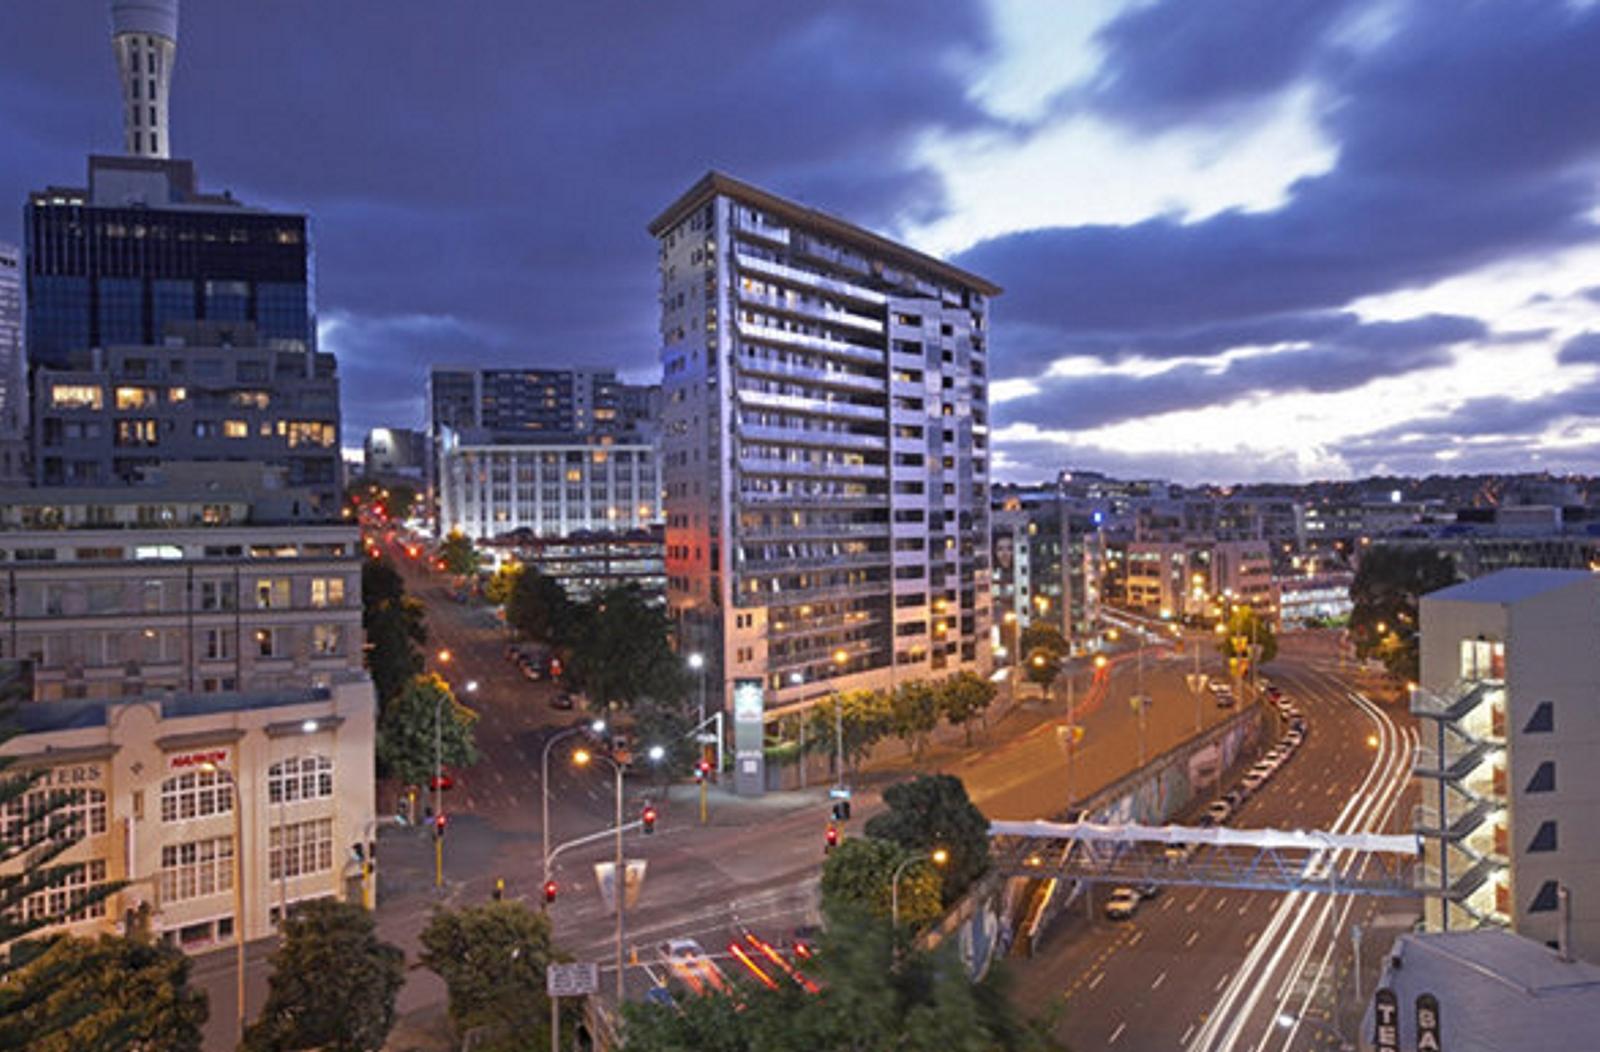 Hotels Hotel Grand Chancellor Auckland Australia Tour